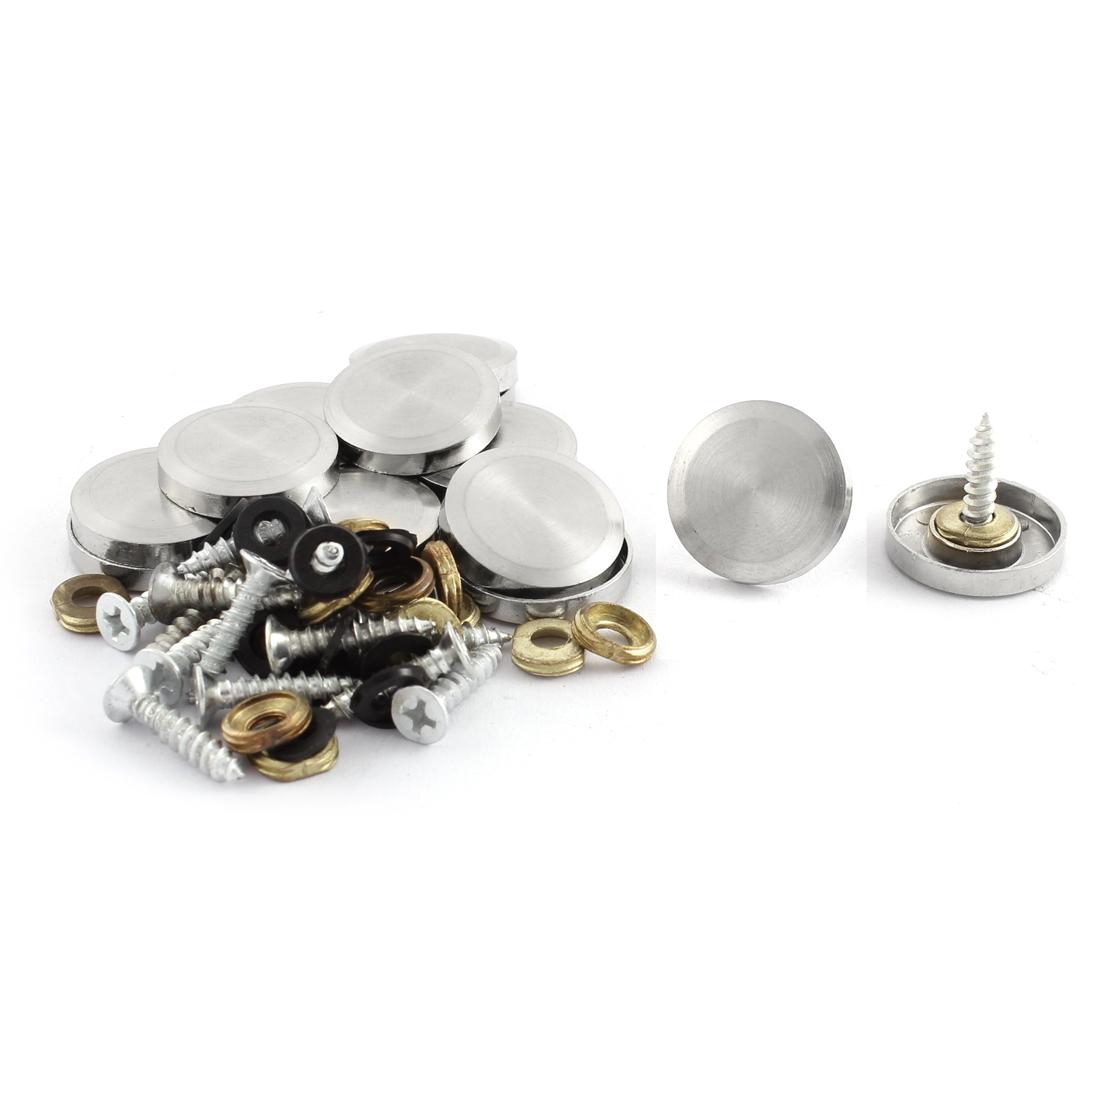 Wardrobe 21mm Diameter Round Cap Decorative Glass Table Mirror Screw Nails 16 Pcs